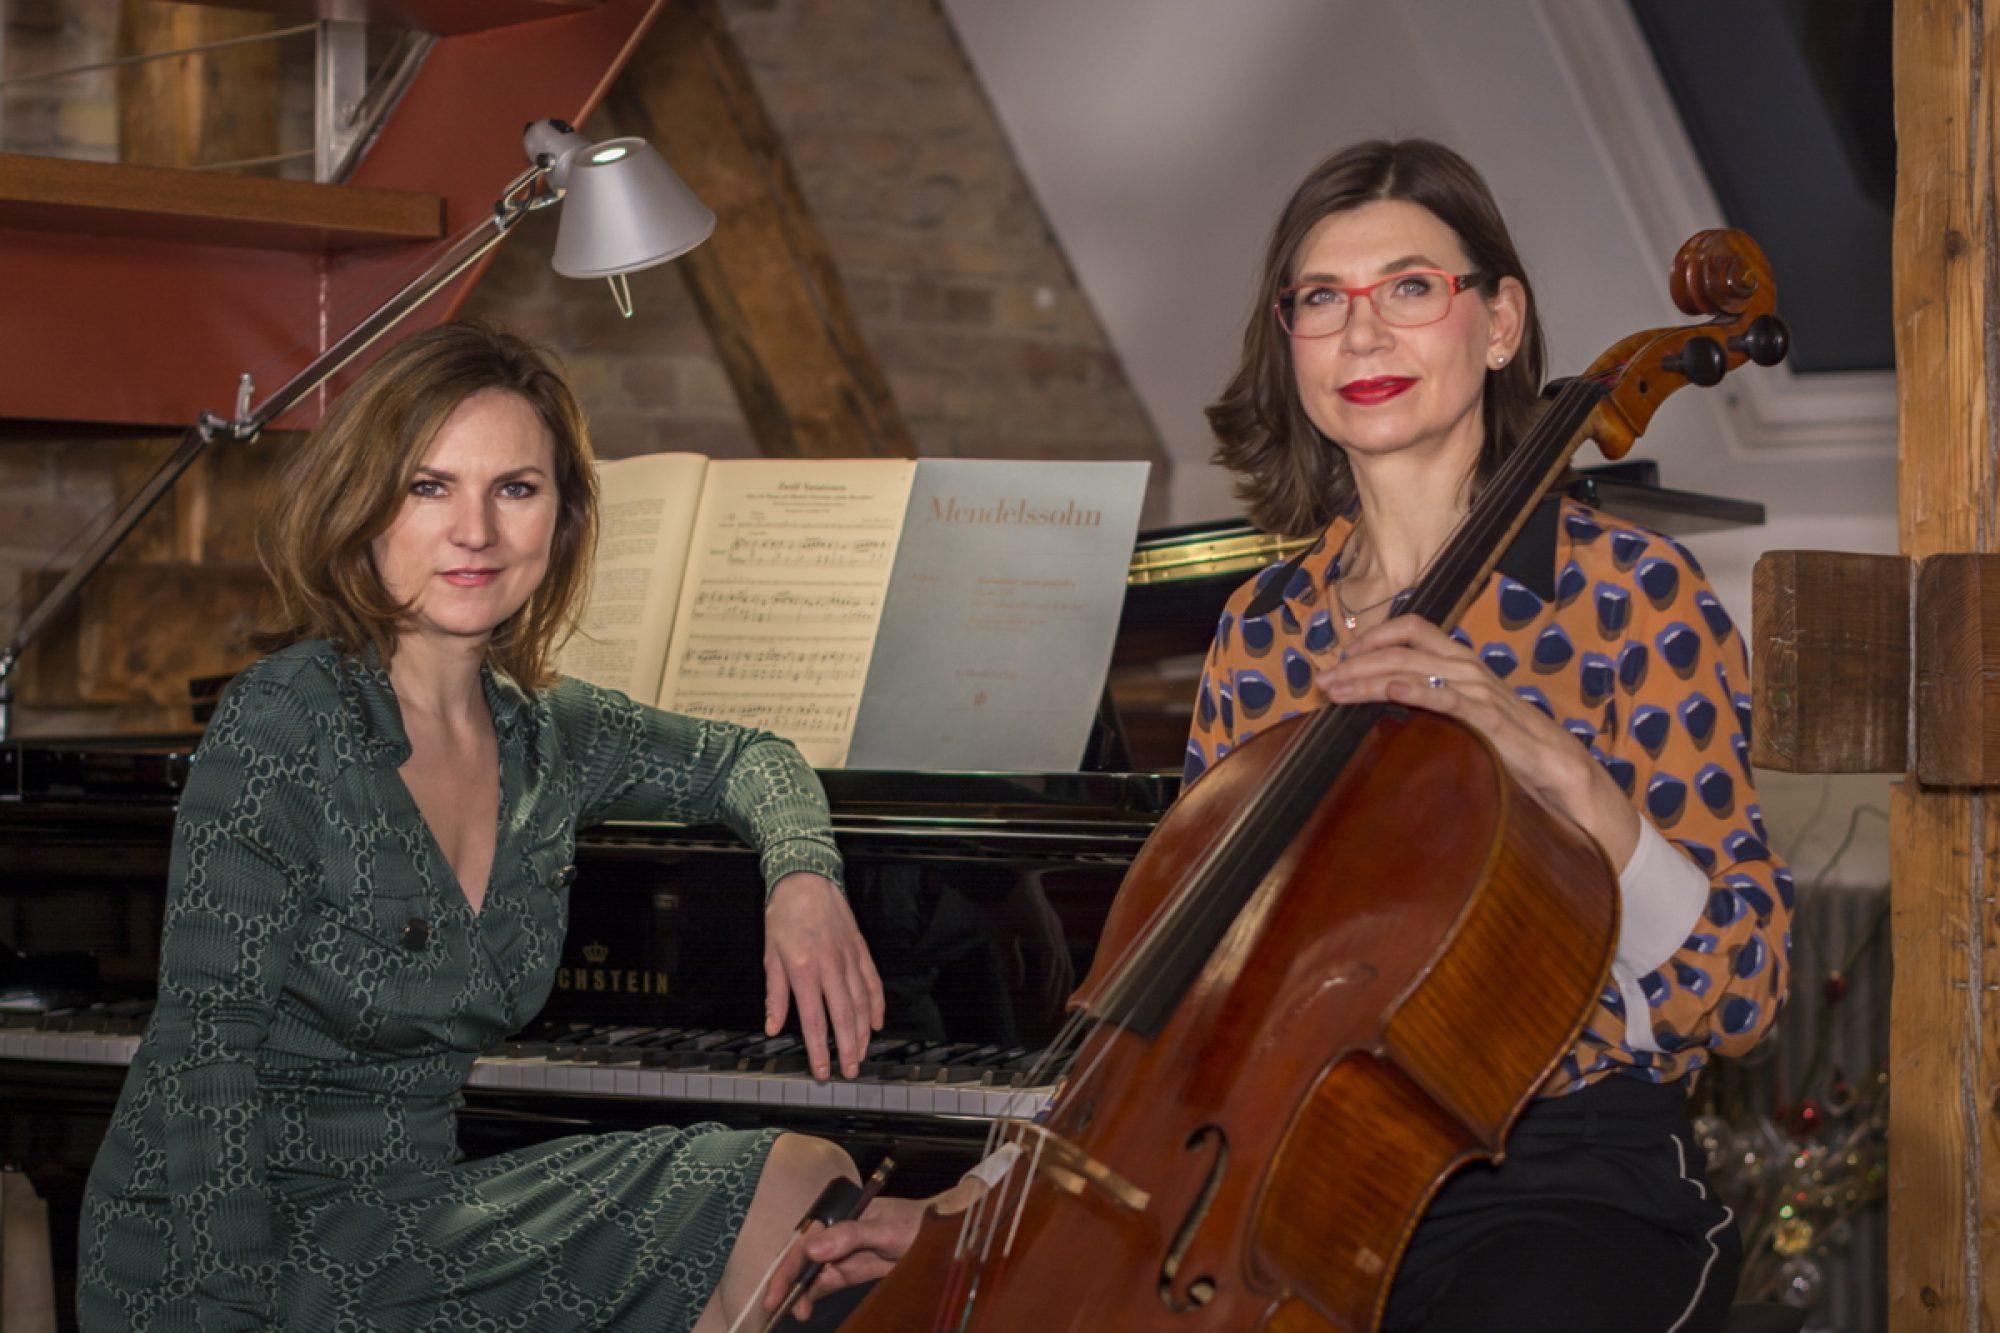 Aalto Ensemble